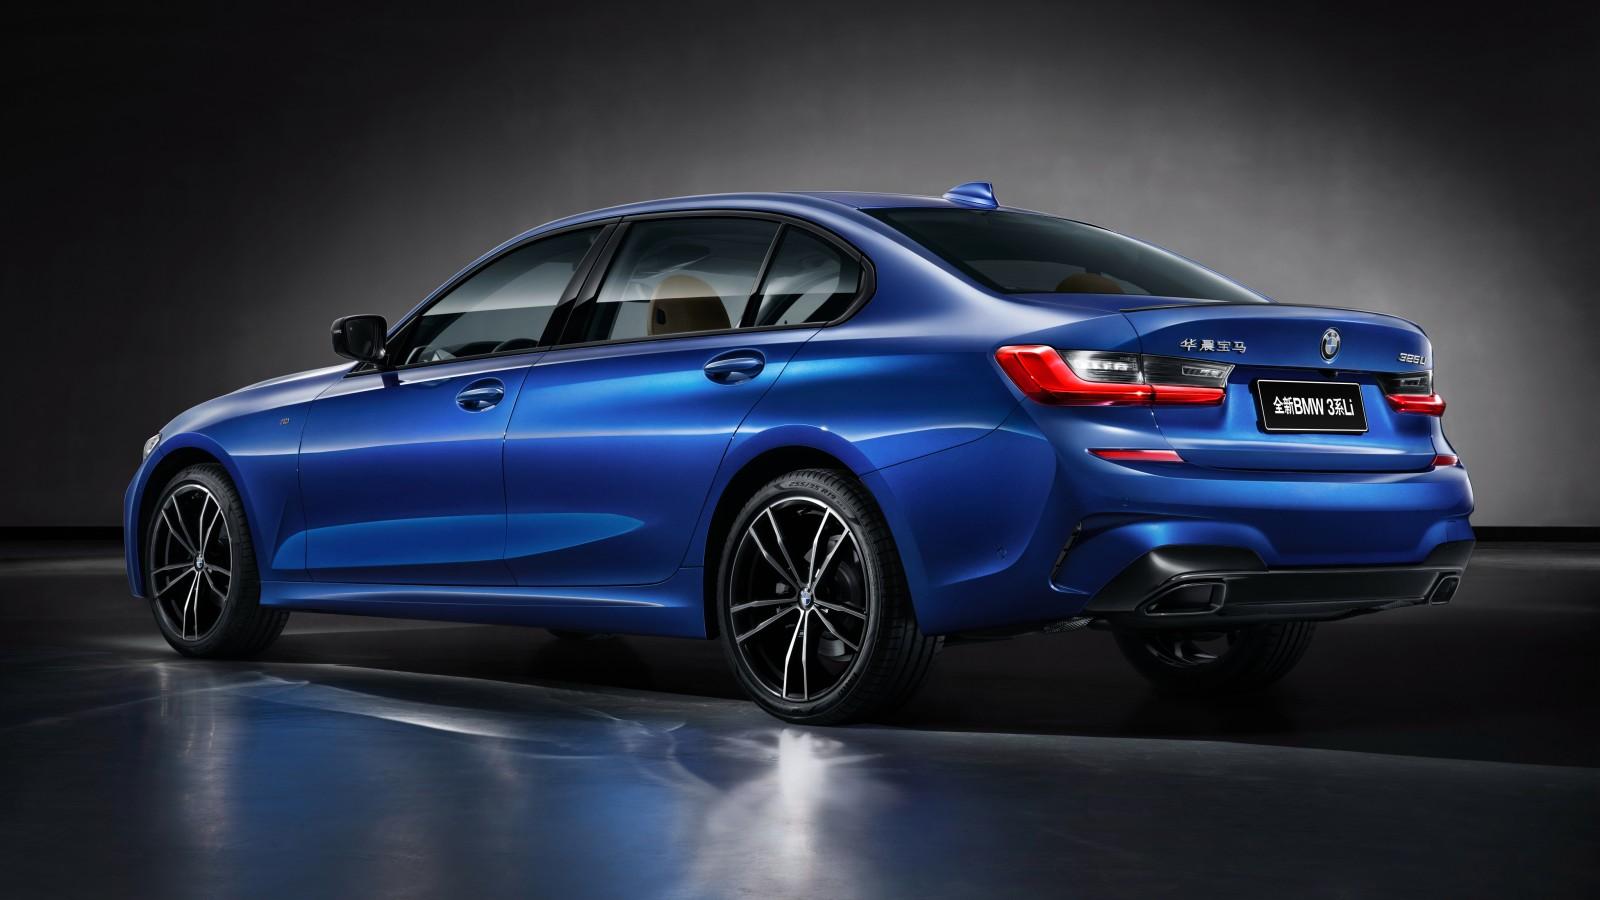 BMW 325Li M Sport 2019 4K 2 Wallpaper